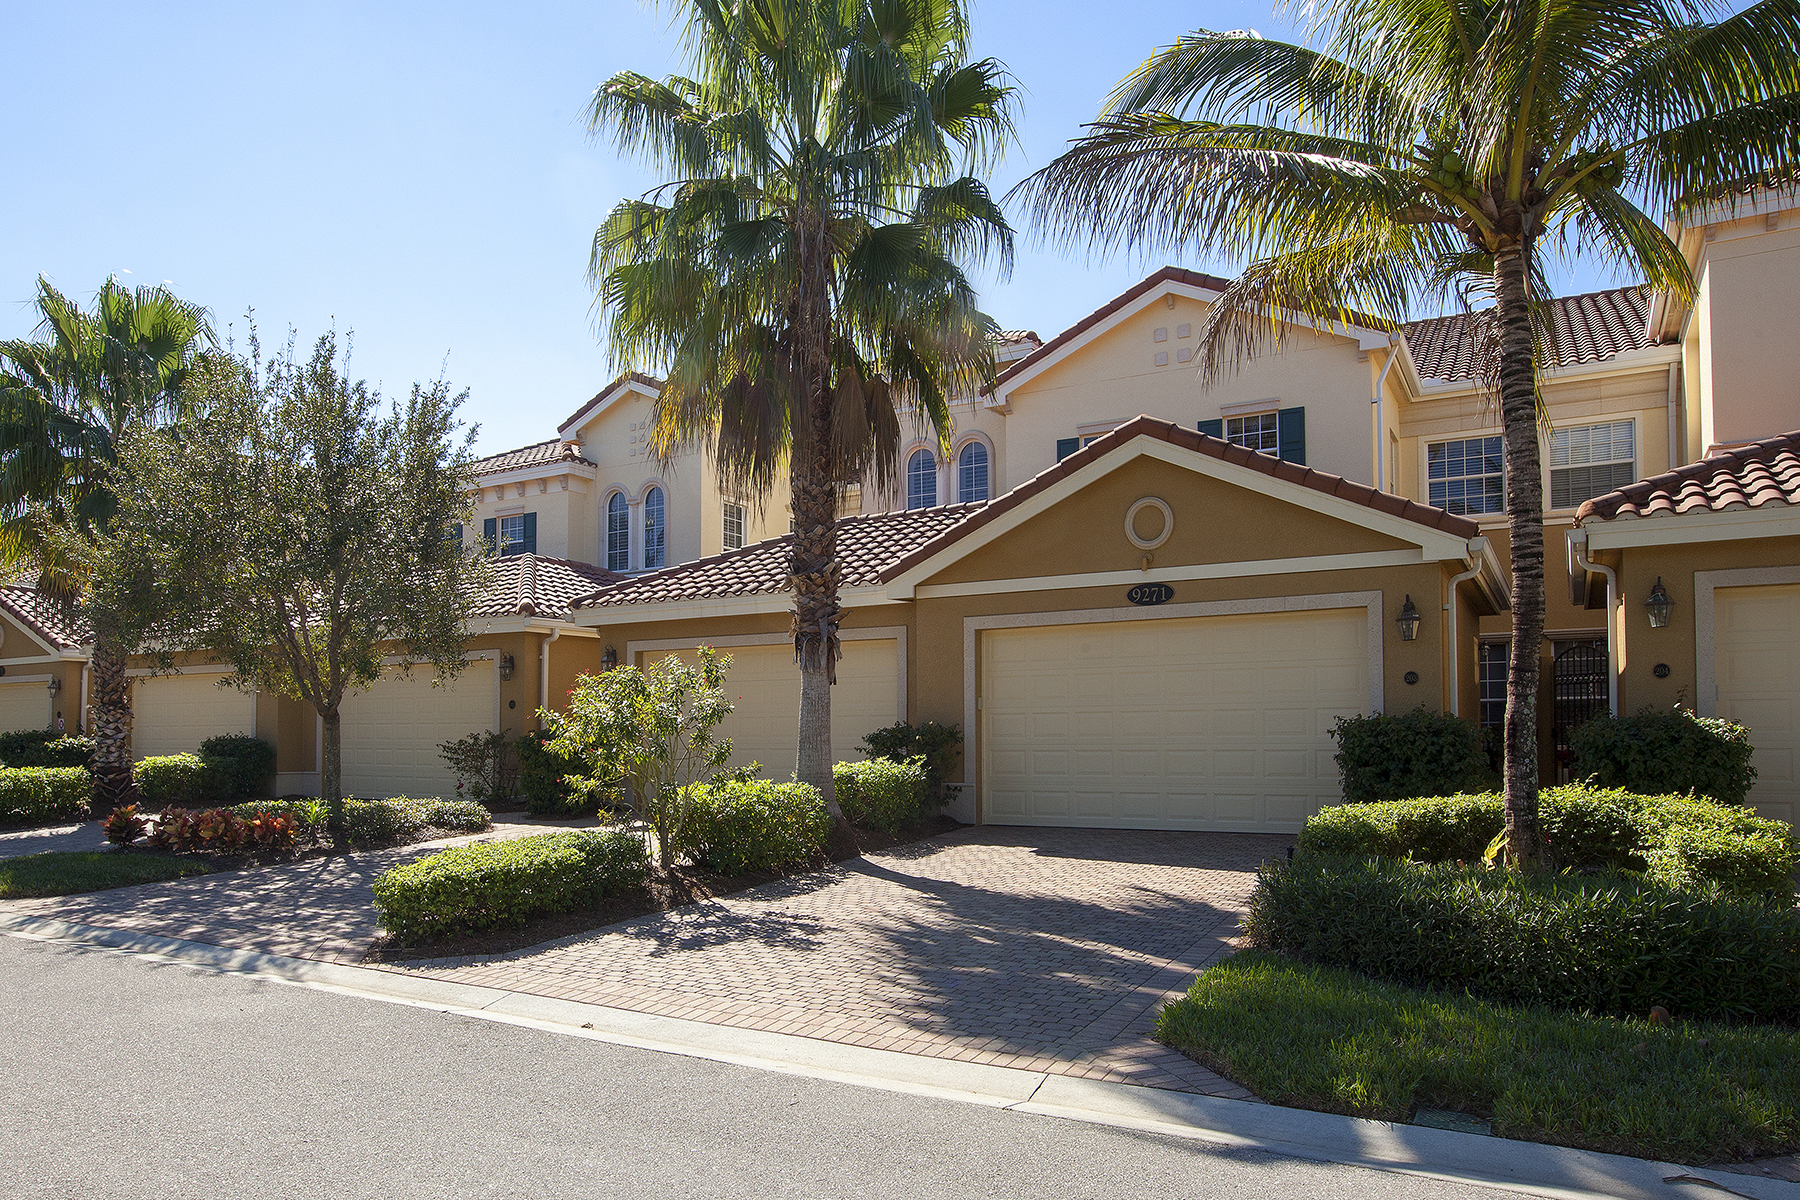 Condominium for Sale at FIDDLER'S CREEK - LAGUNA 9271 Museo Cir 203 Naples, Florida 34114 United States